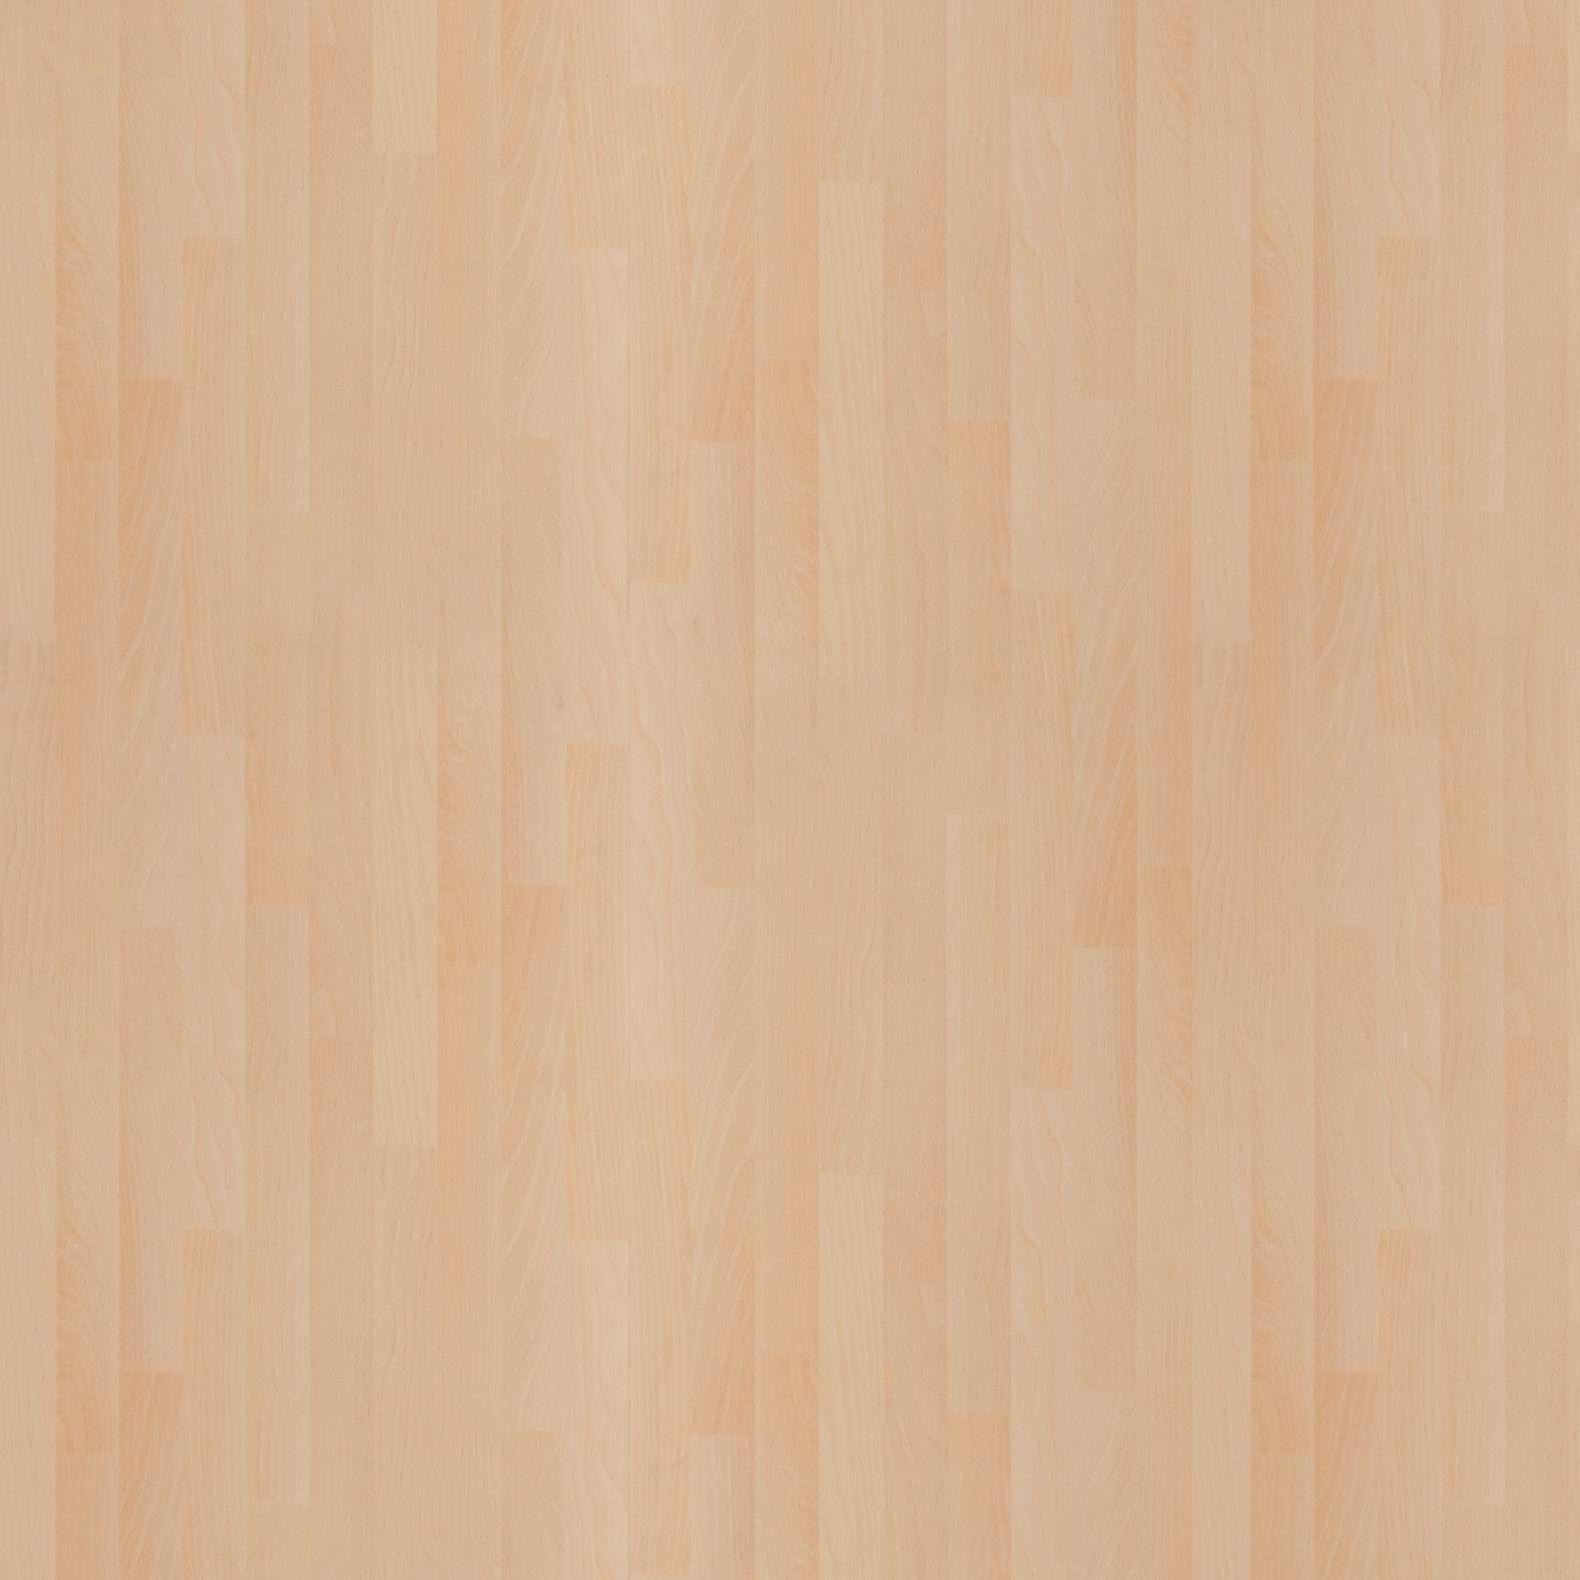 hardwood sheet floors wood team image vinyl l flooring grain